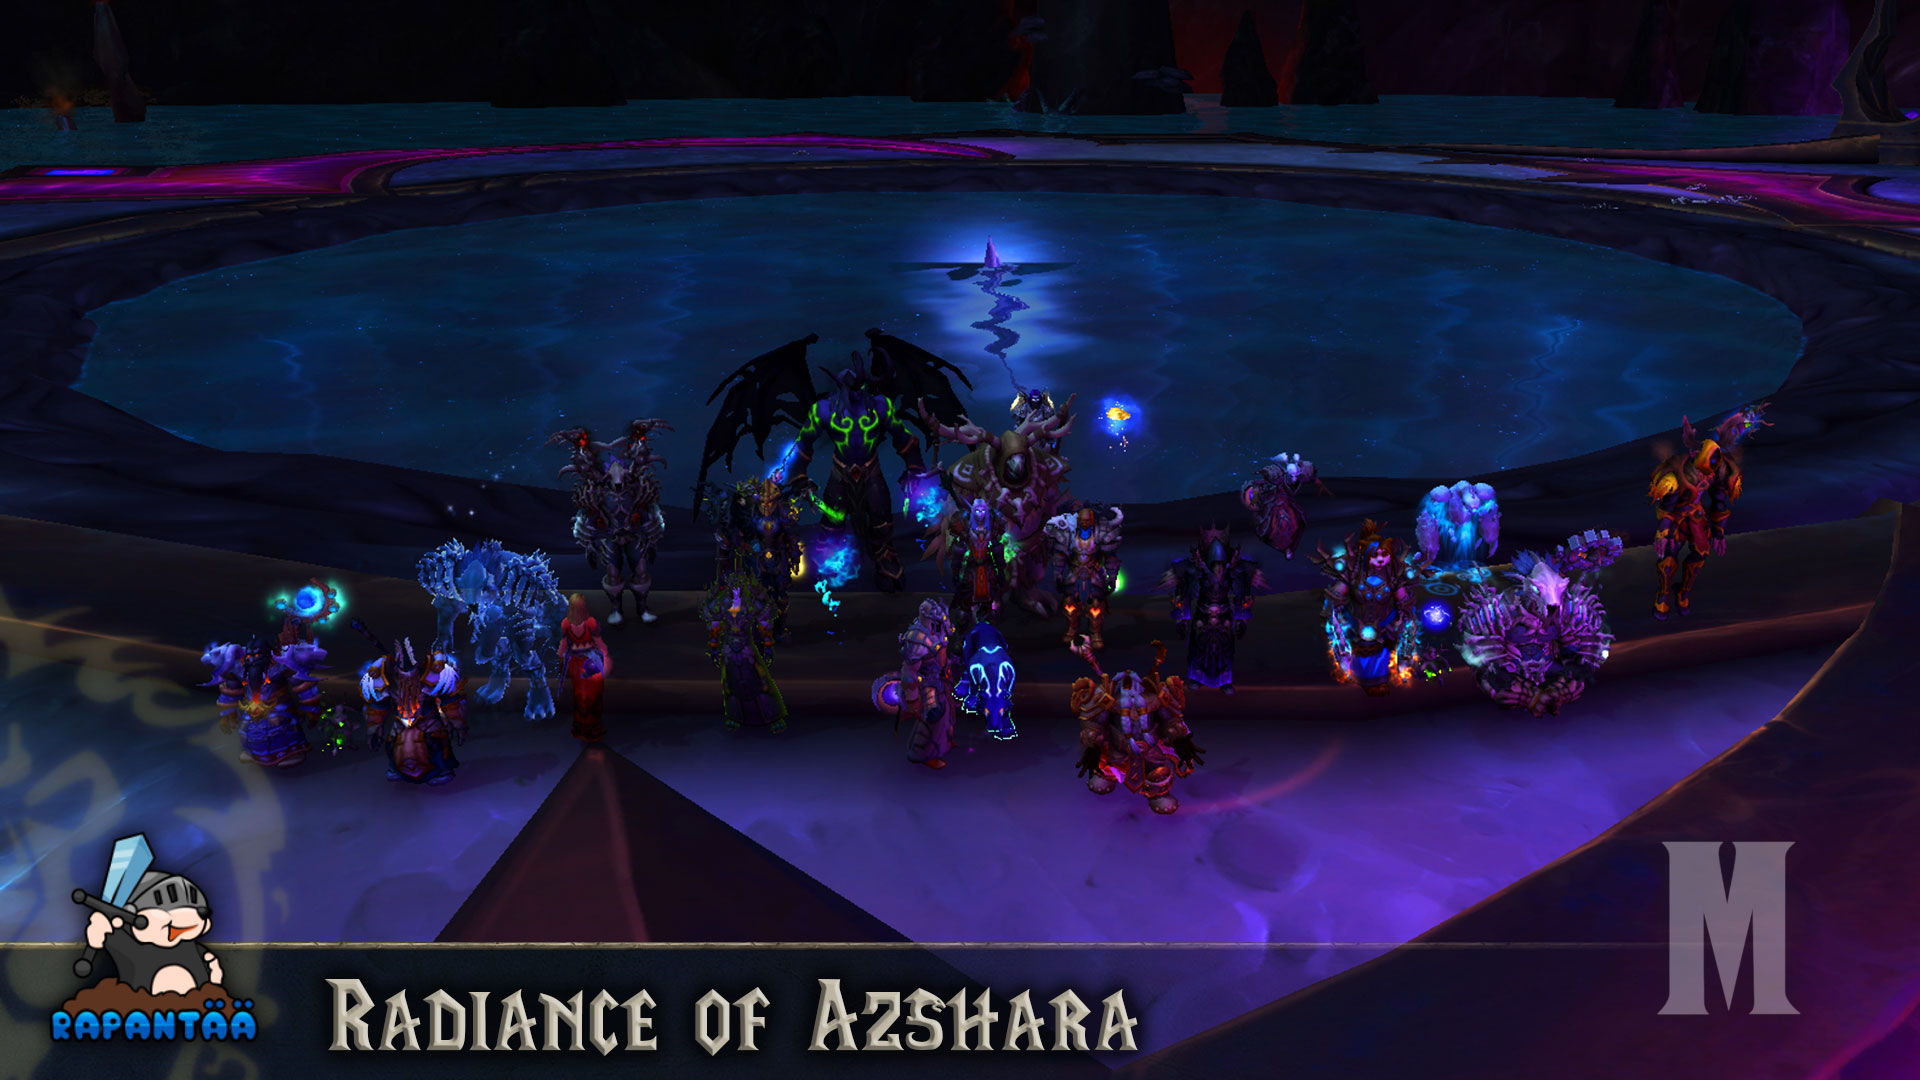 radiance-of-azshara-m-10.09.2019